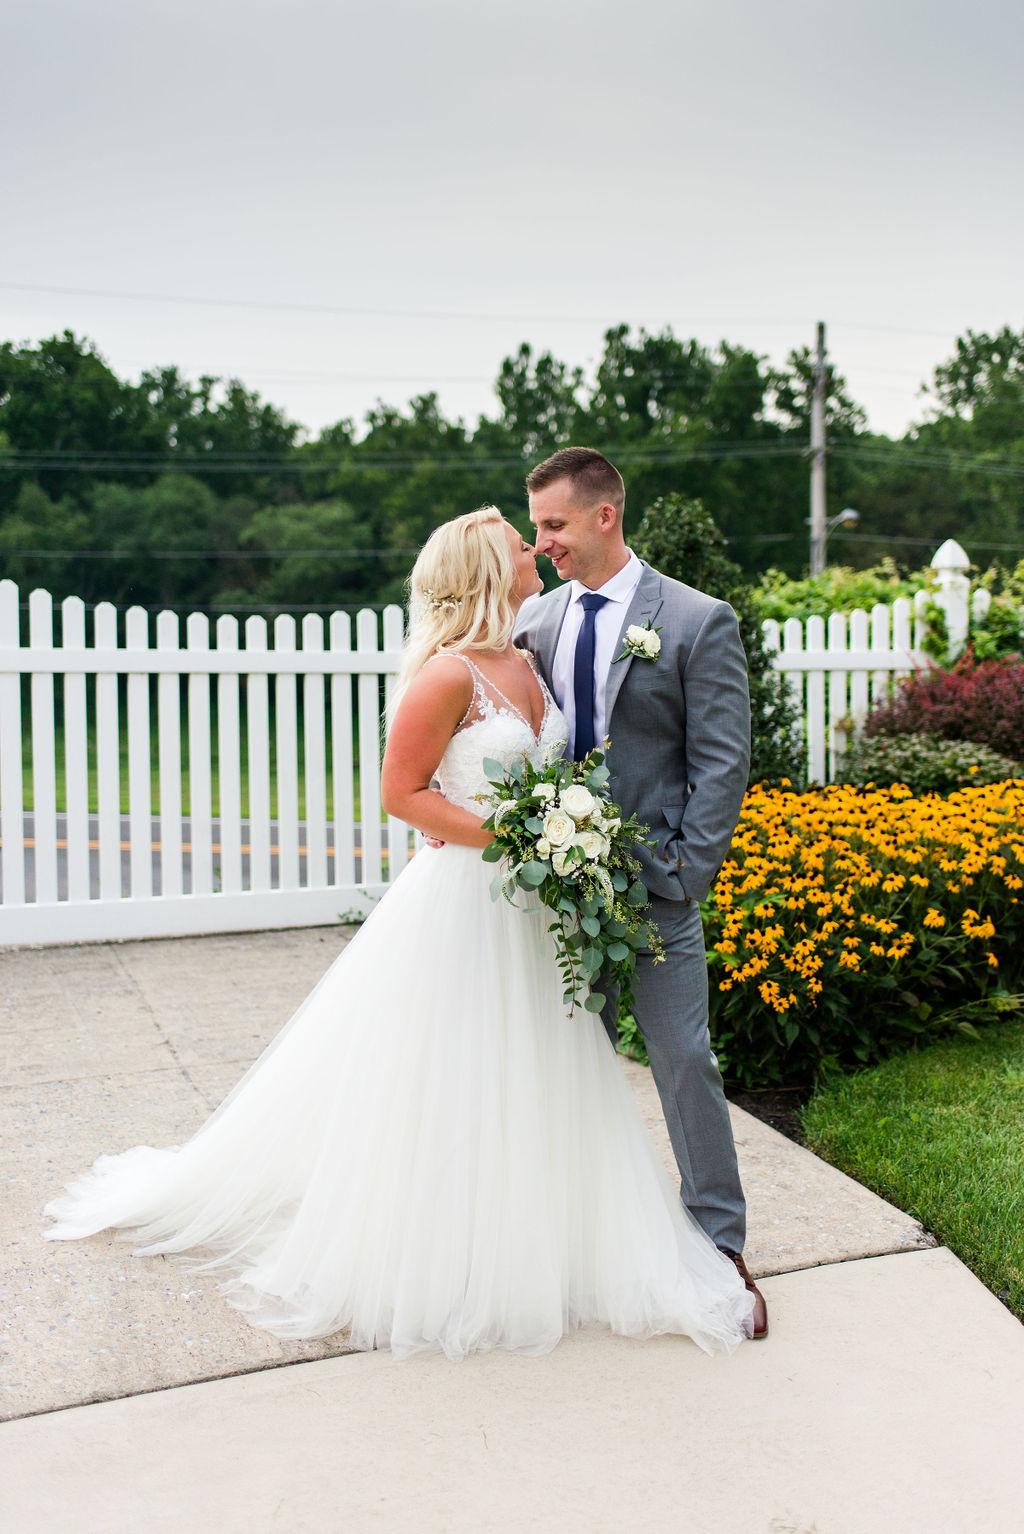 post-ceremony-barn-on-bridge-wedding-pho